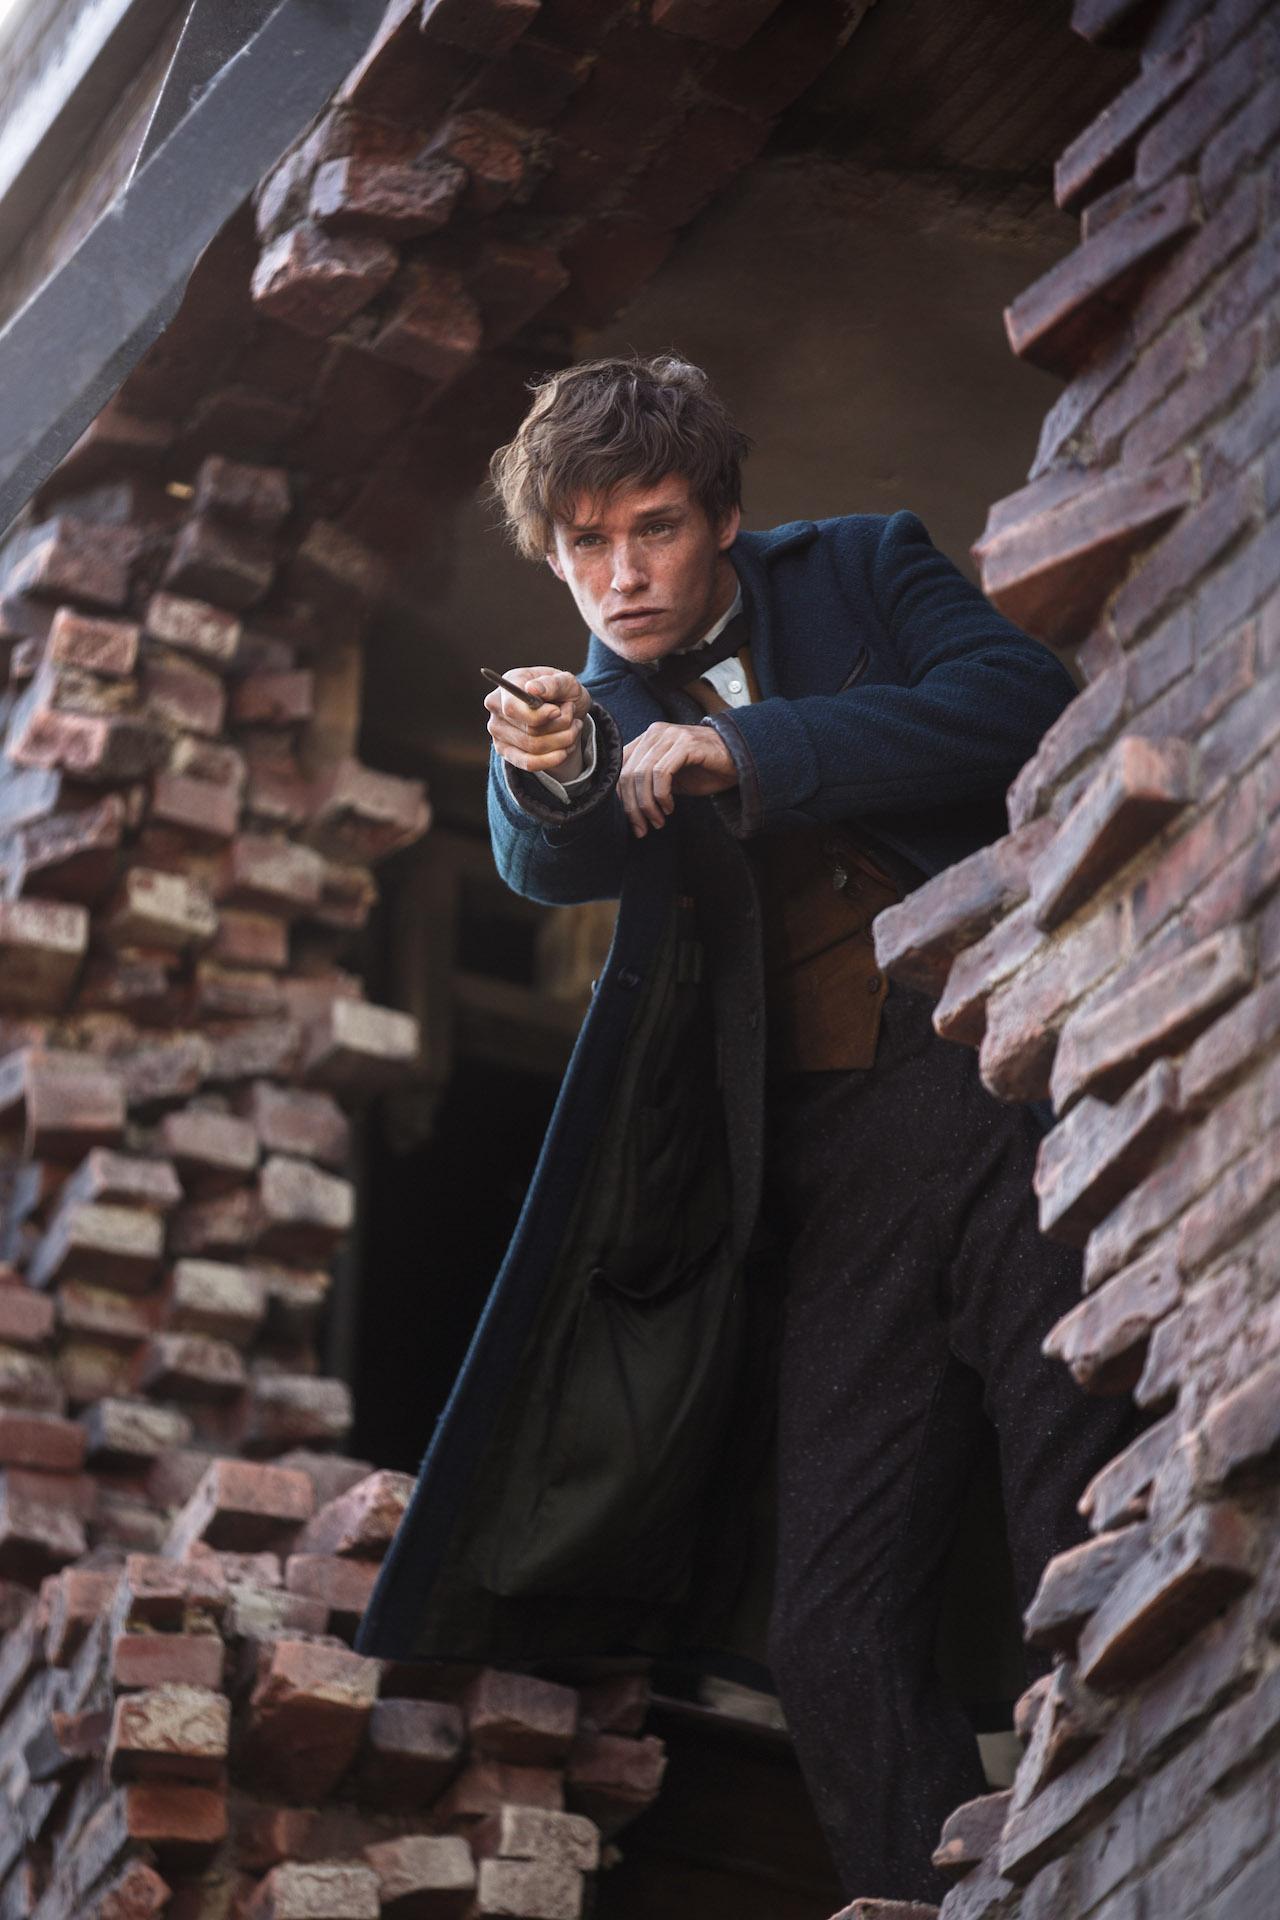 Animali Fantastici e Dove Trovarli: Eddie Redmayne interpreta Newt Scamander